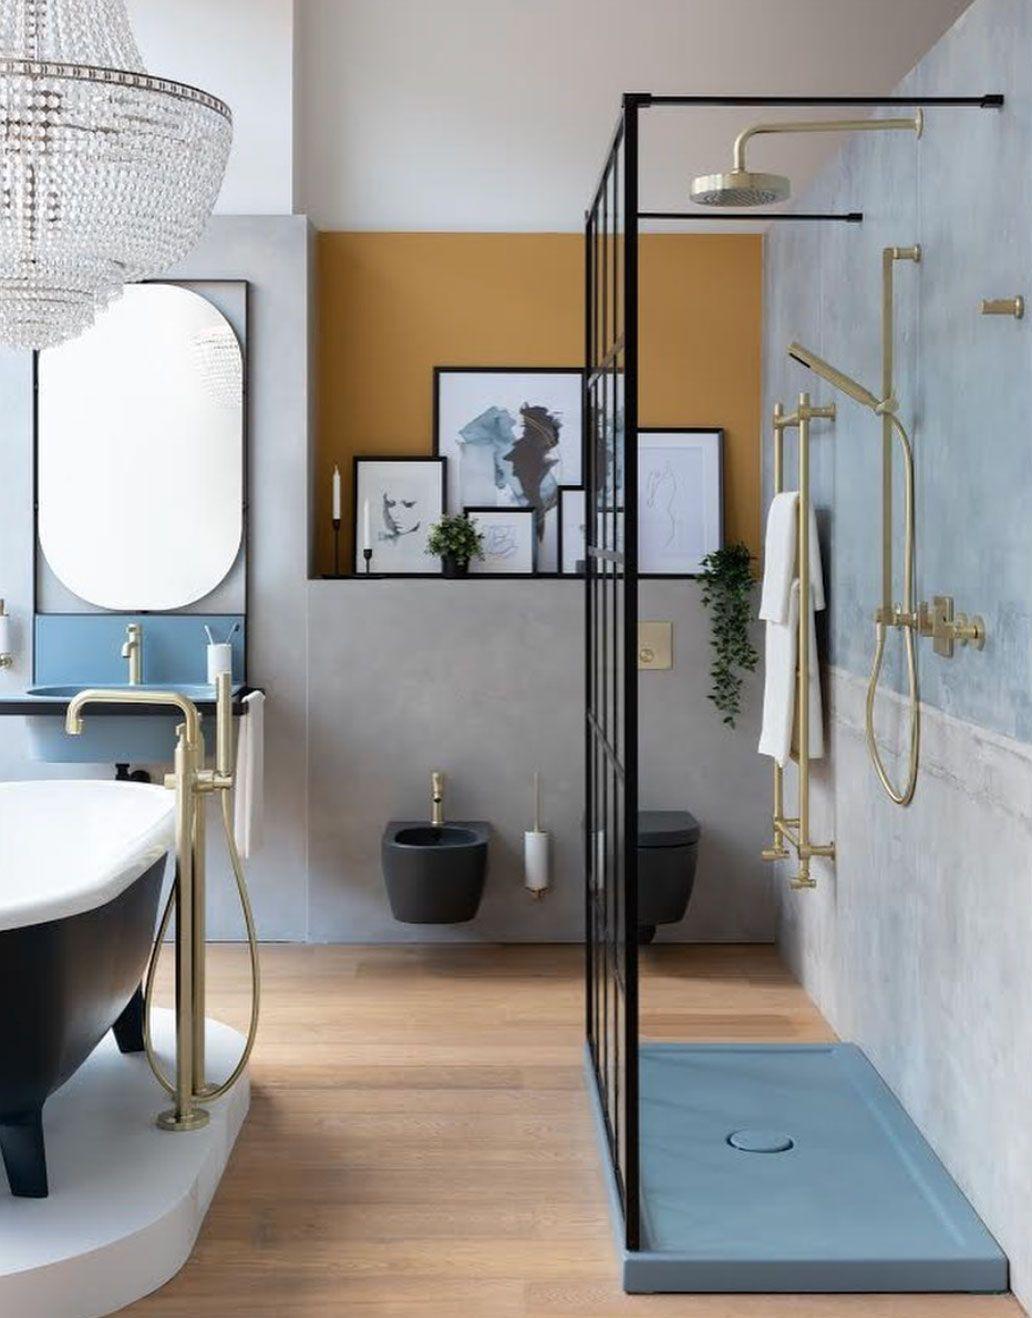 7 beautiful bathroom art ideas, plus how to display it